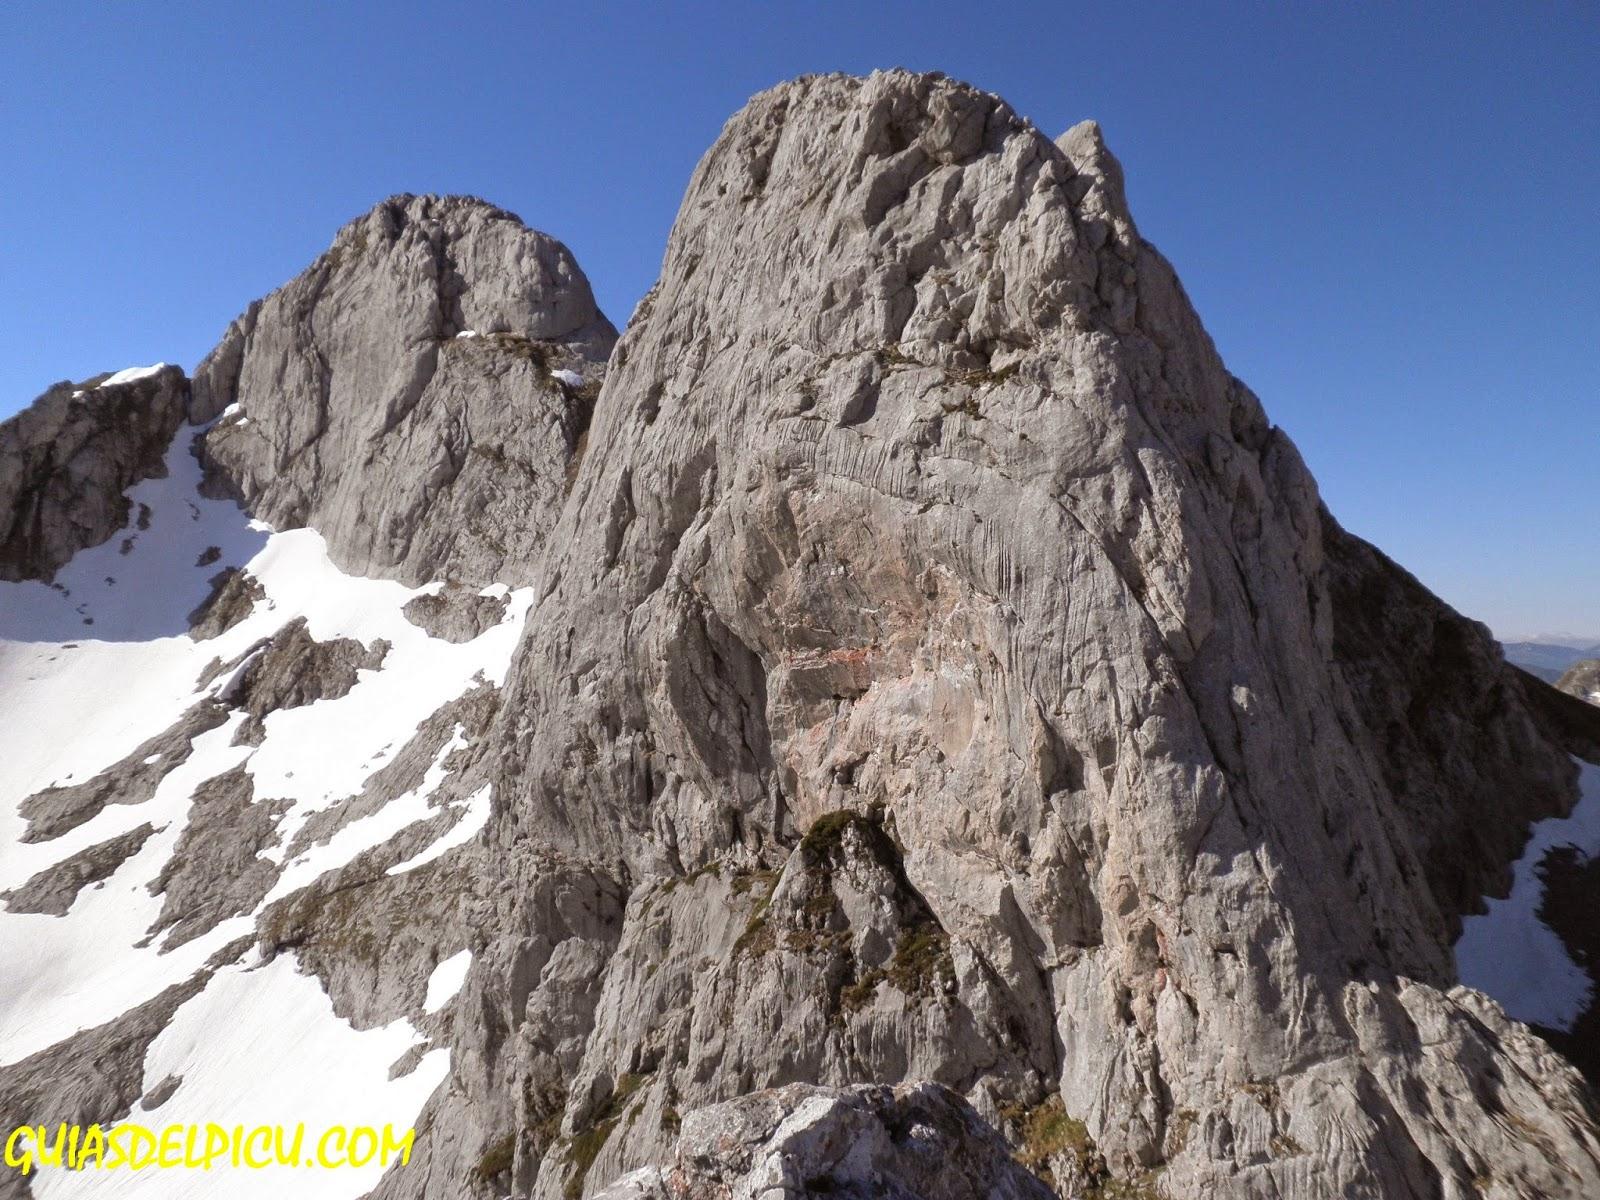 Fernando Calvo guia de montaña, especialista en picos de europa, guiasdelpicu.com